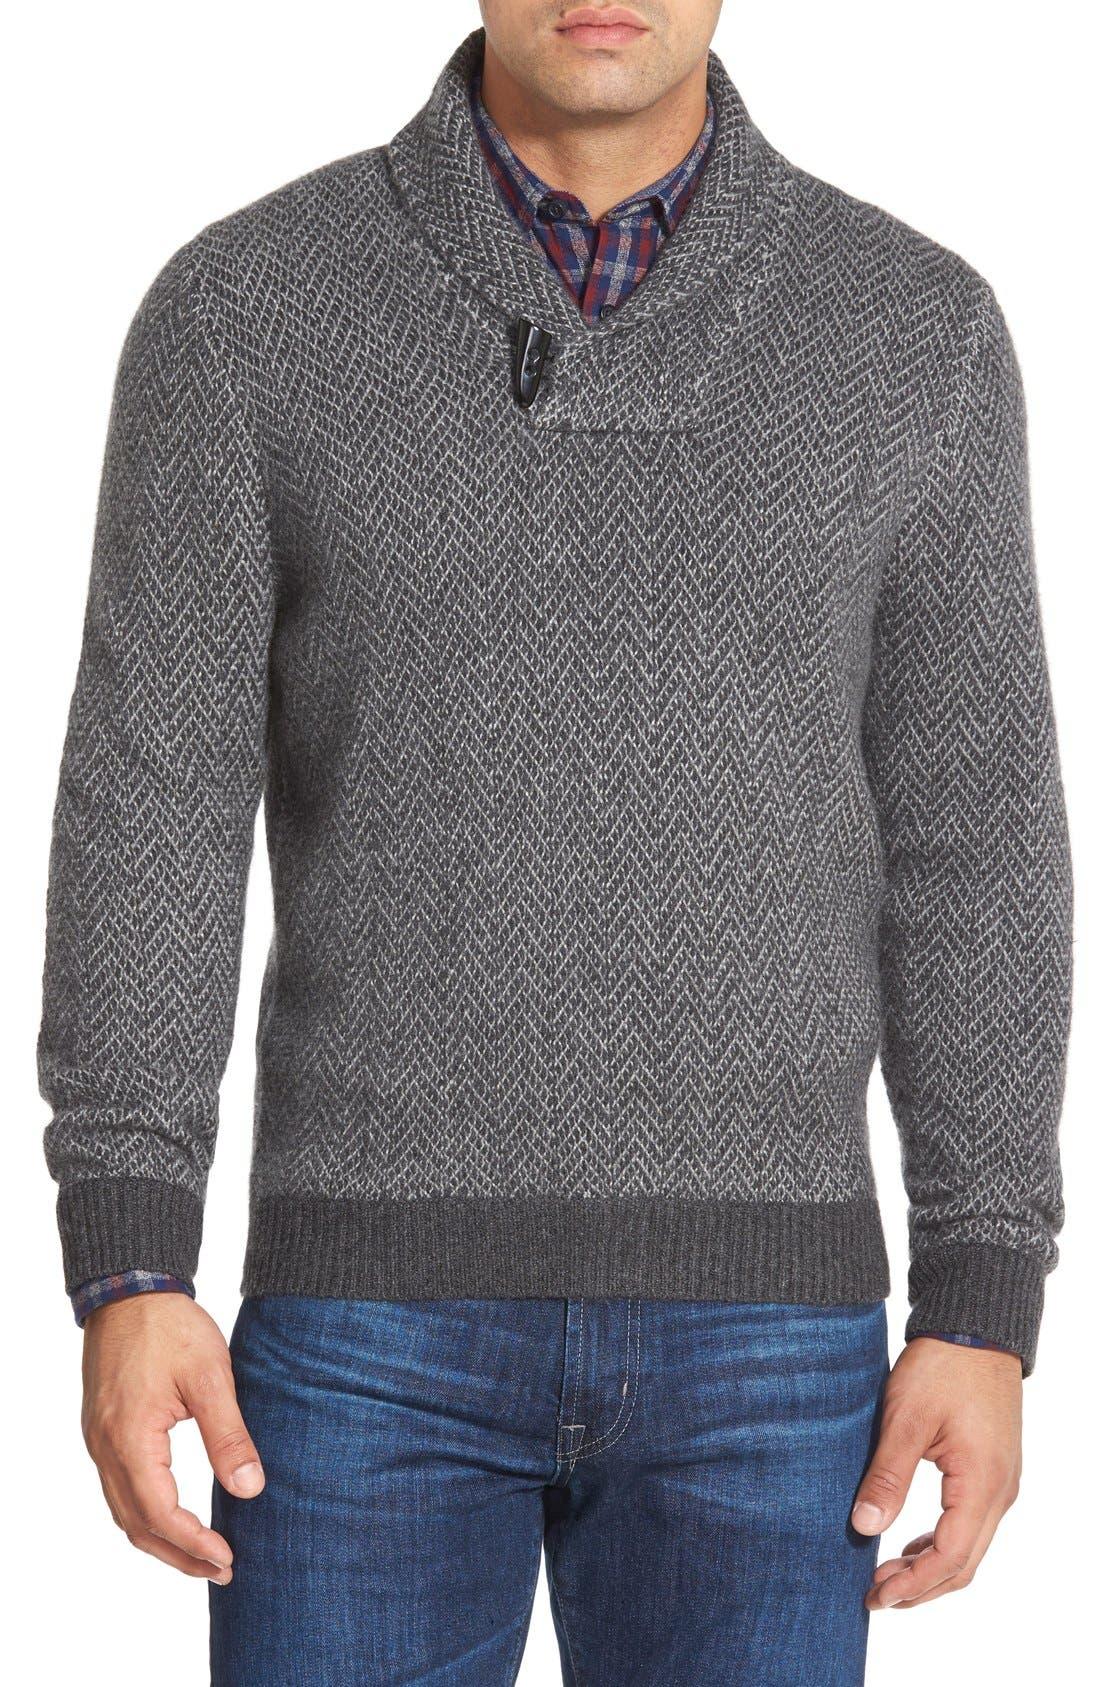 Alternate Image 1 Selected - John W. Nordstrom® Shawl Collar Cashmere Sweater (Regular & Tall)